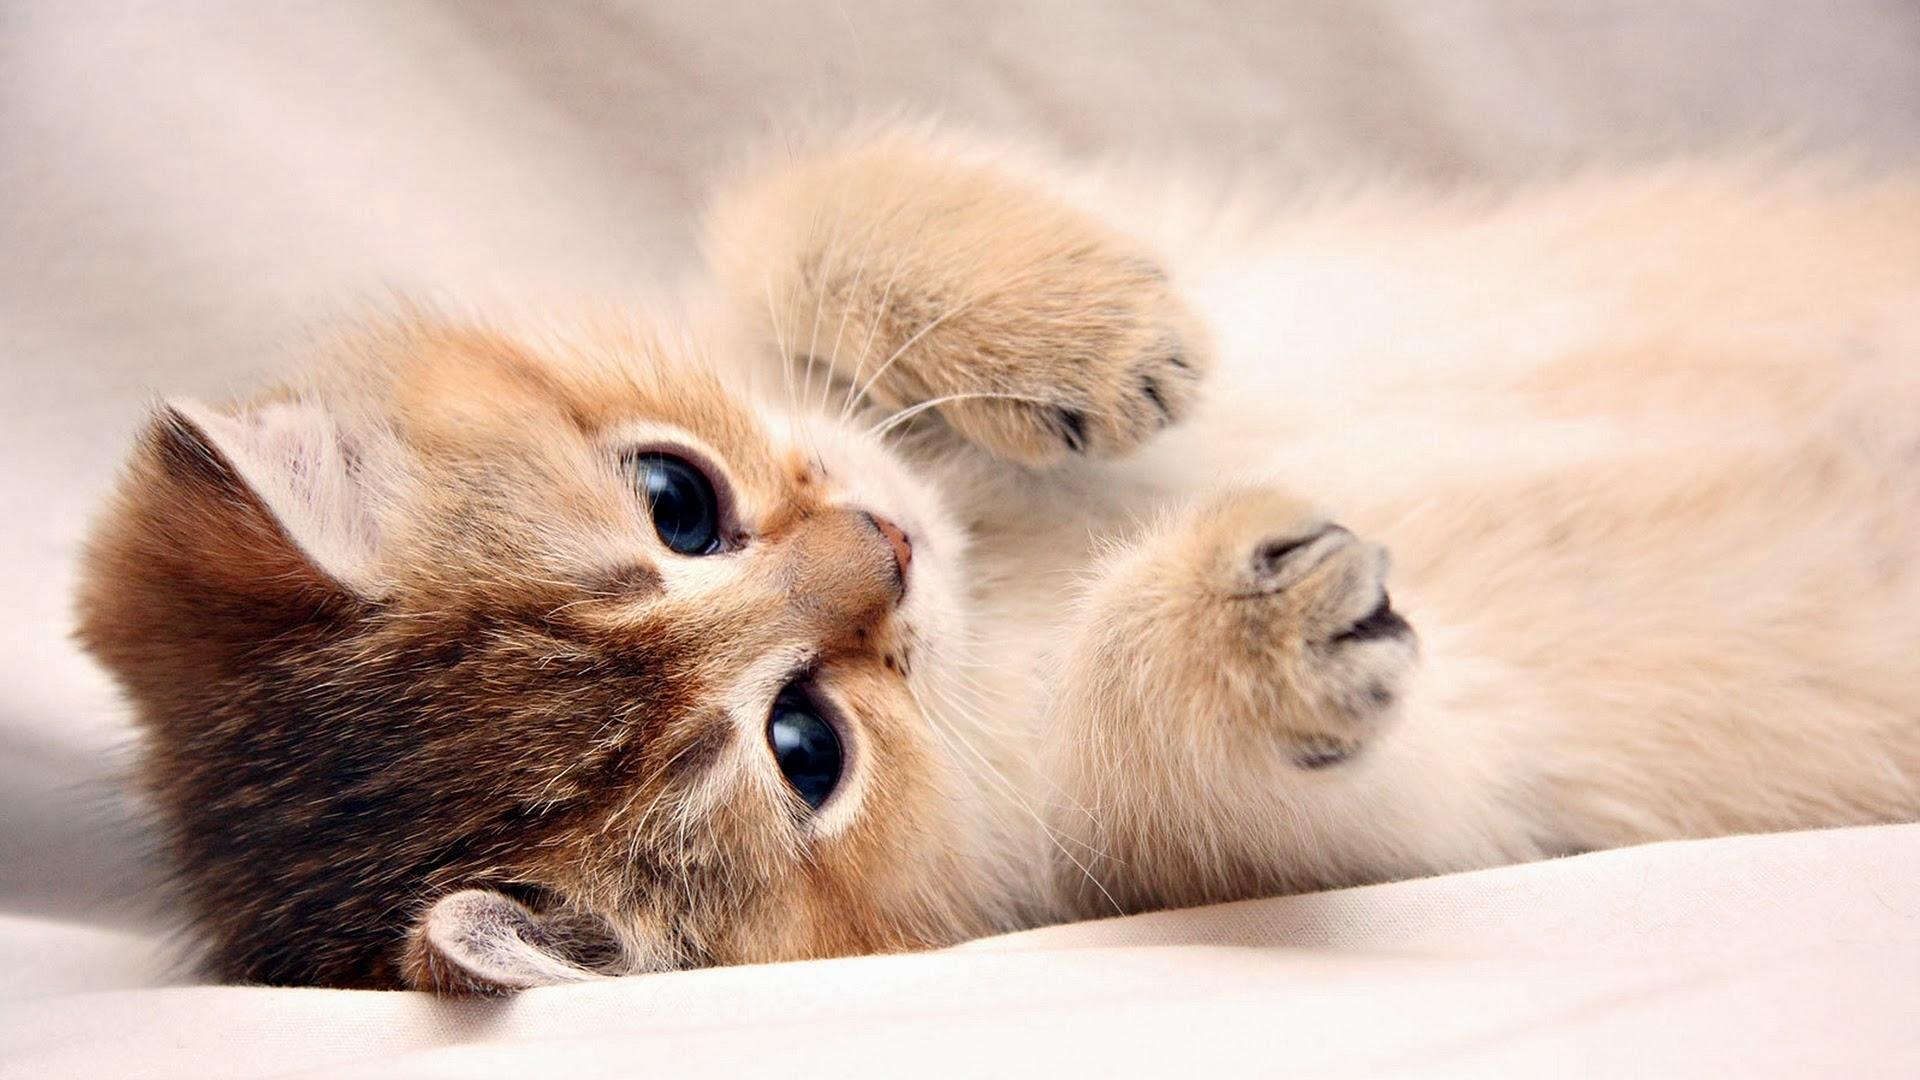 10 best hd cute cat wallpapers full hd 1080p for pc desktop 2018